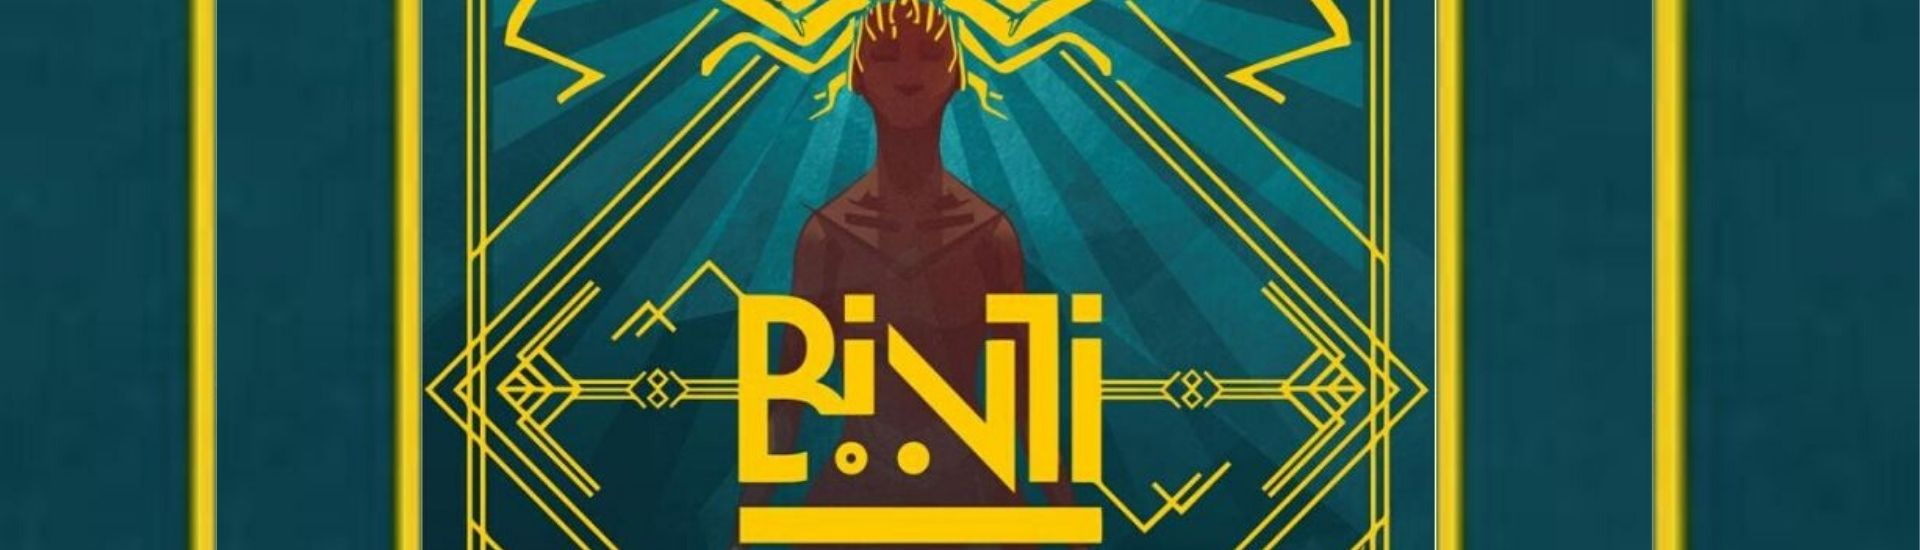 Trilogie Binti de Nnedi Okorafor (Afrofuturisme)